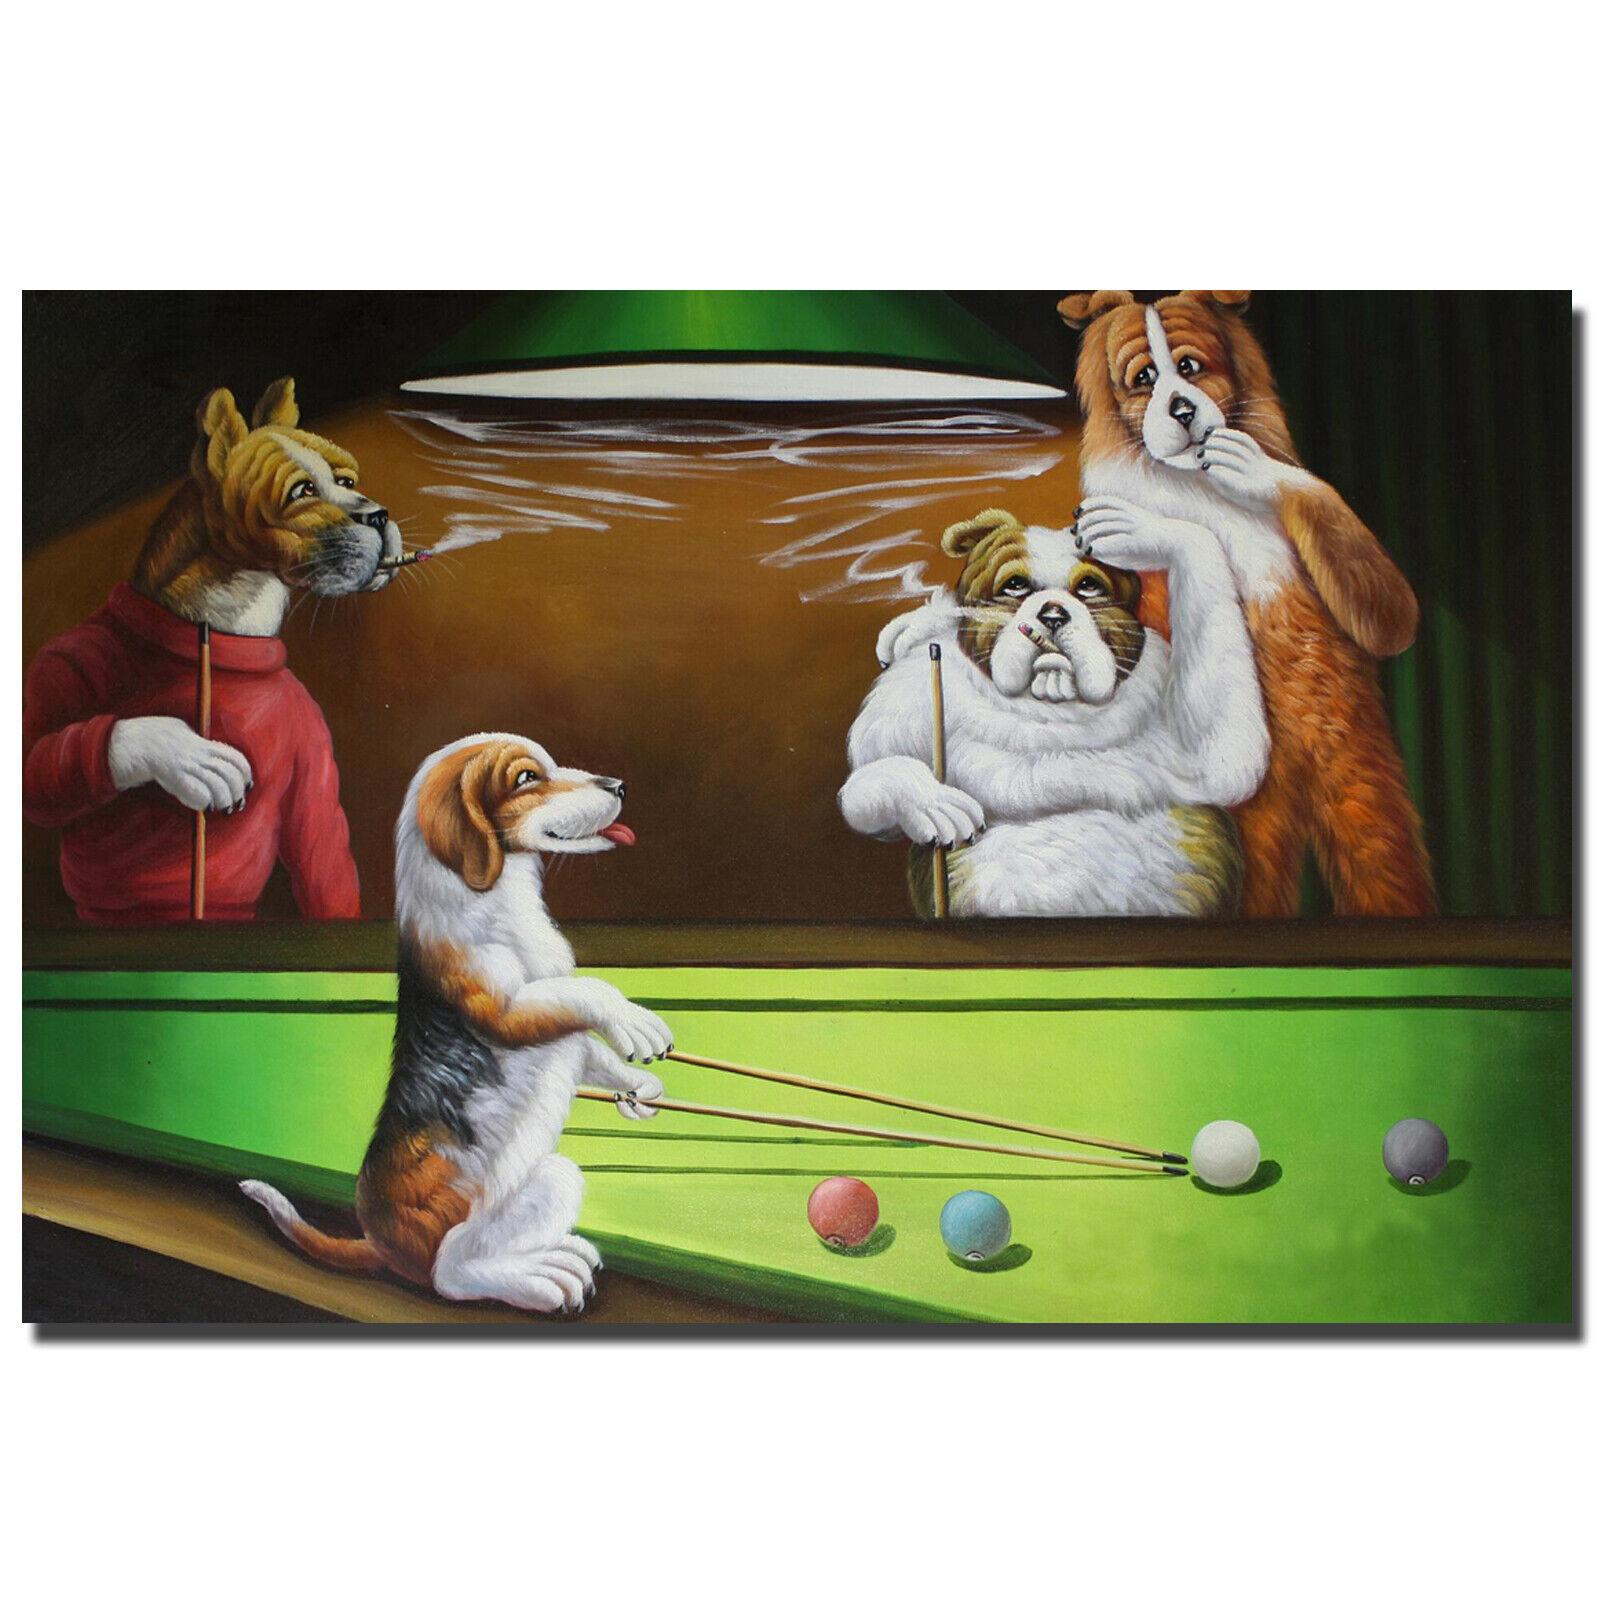 Arthur Saron Sarnoff Dogs Playing Poker Giclee Paper Print Poster Reproduction